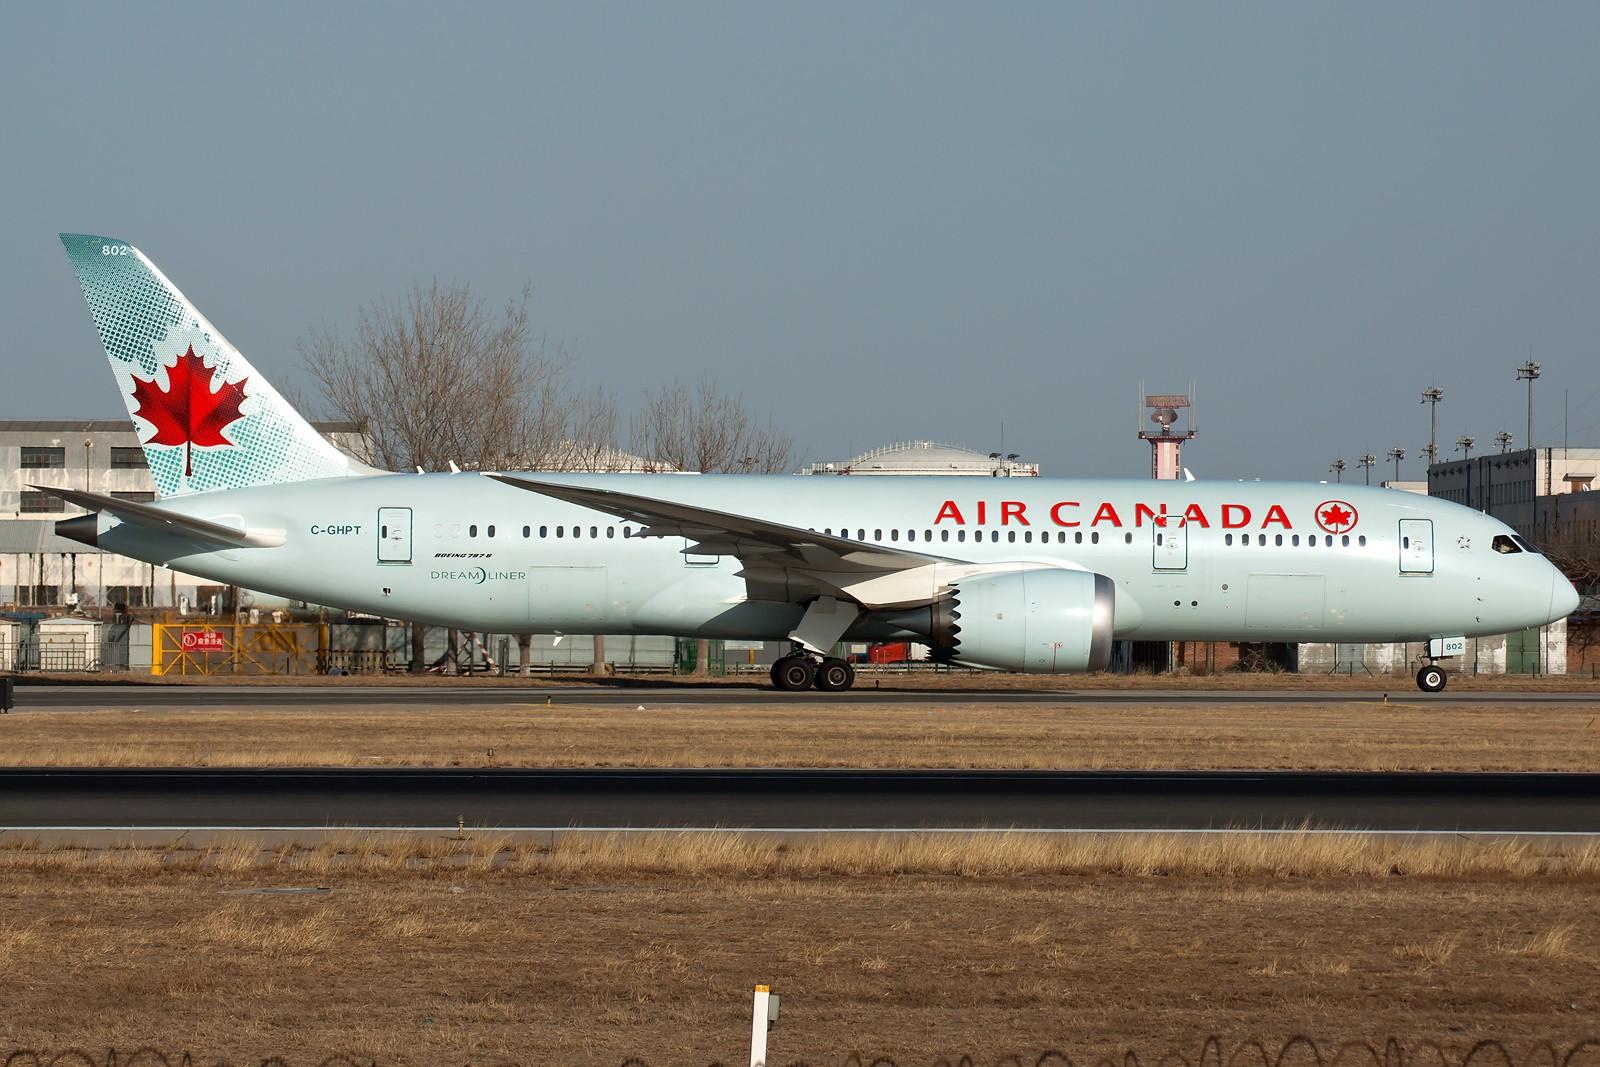 [原创][一图党] 加拿大航空 C-GHPT B787-8 Dreamliner BOEING B787-8 DREAMLINER C-GHPT 中国北京首都国际机场